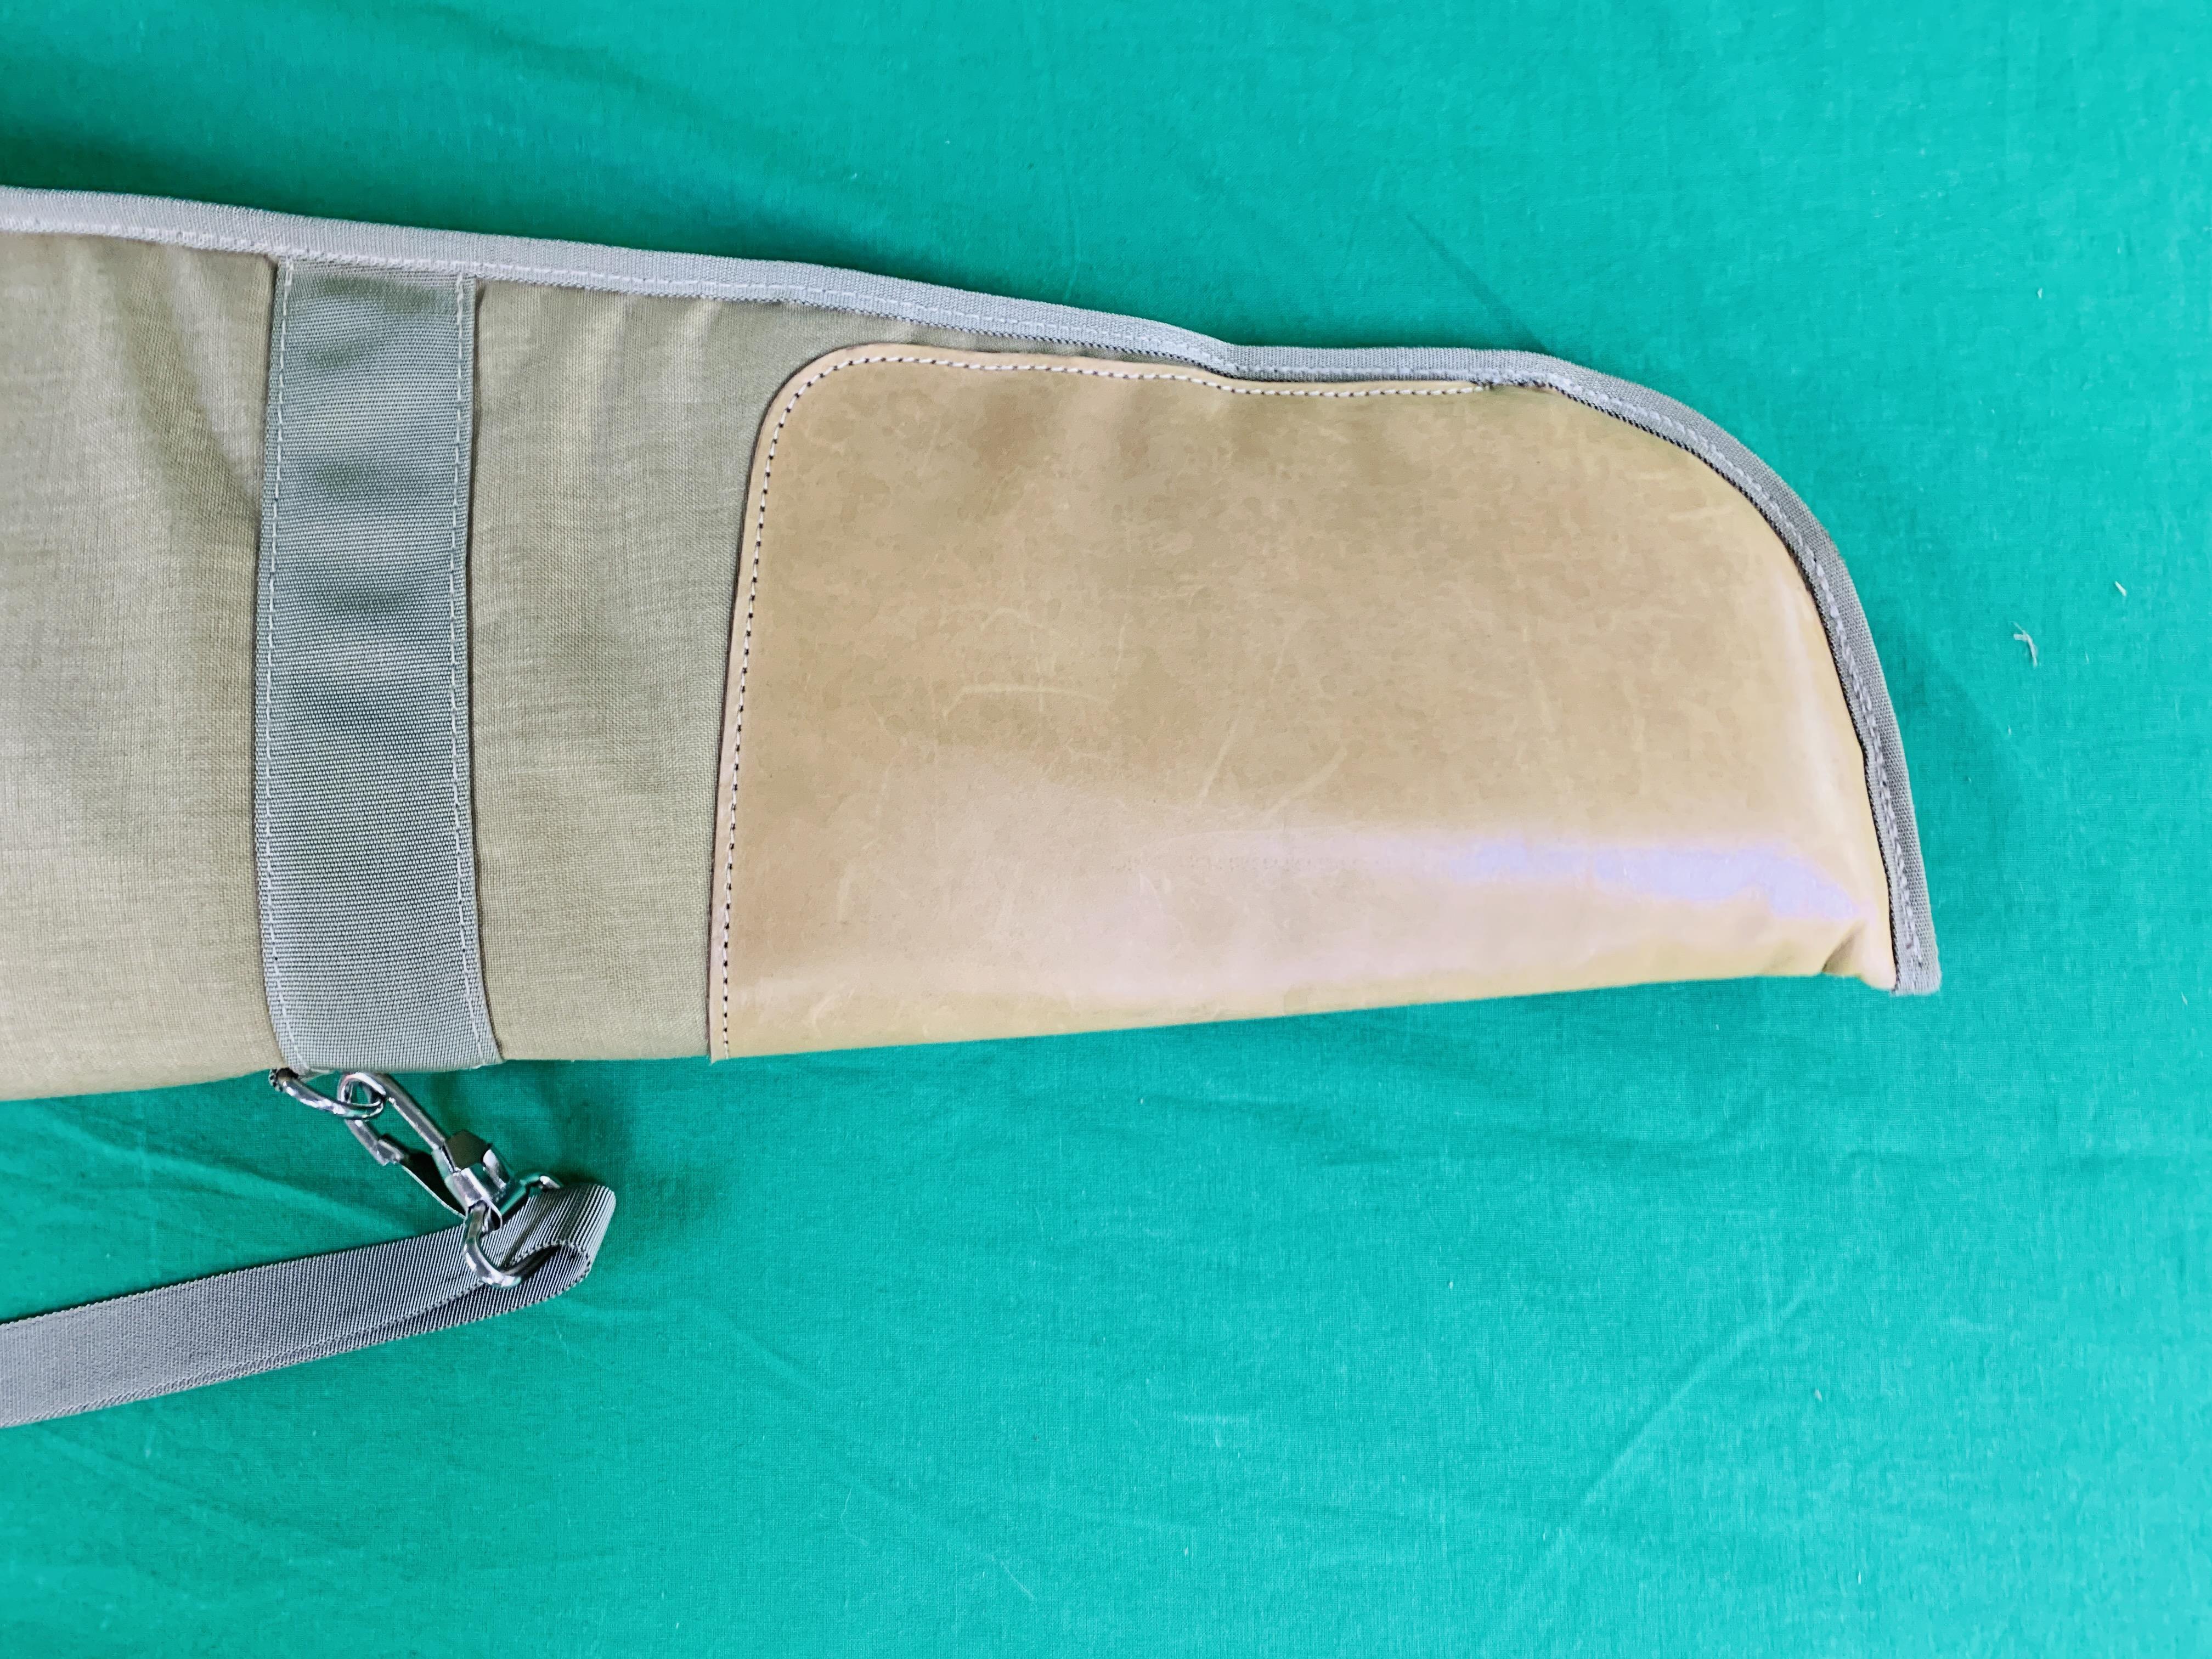 A OGDEN QUICKSLIP RIFLE SLIP WITH INTERNAL POCKETS 1. - Image 4 of 7